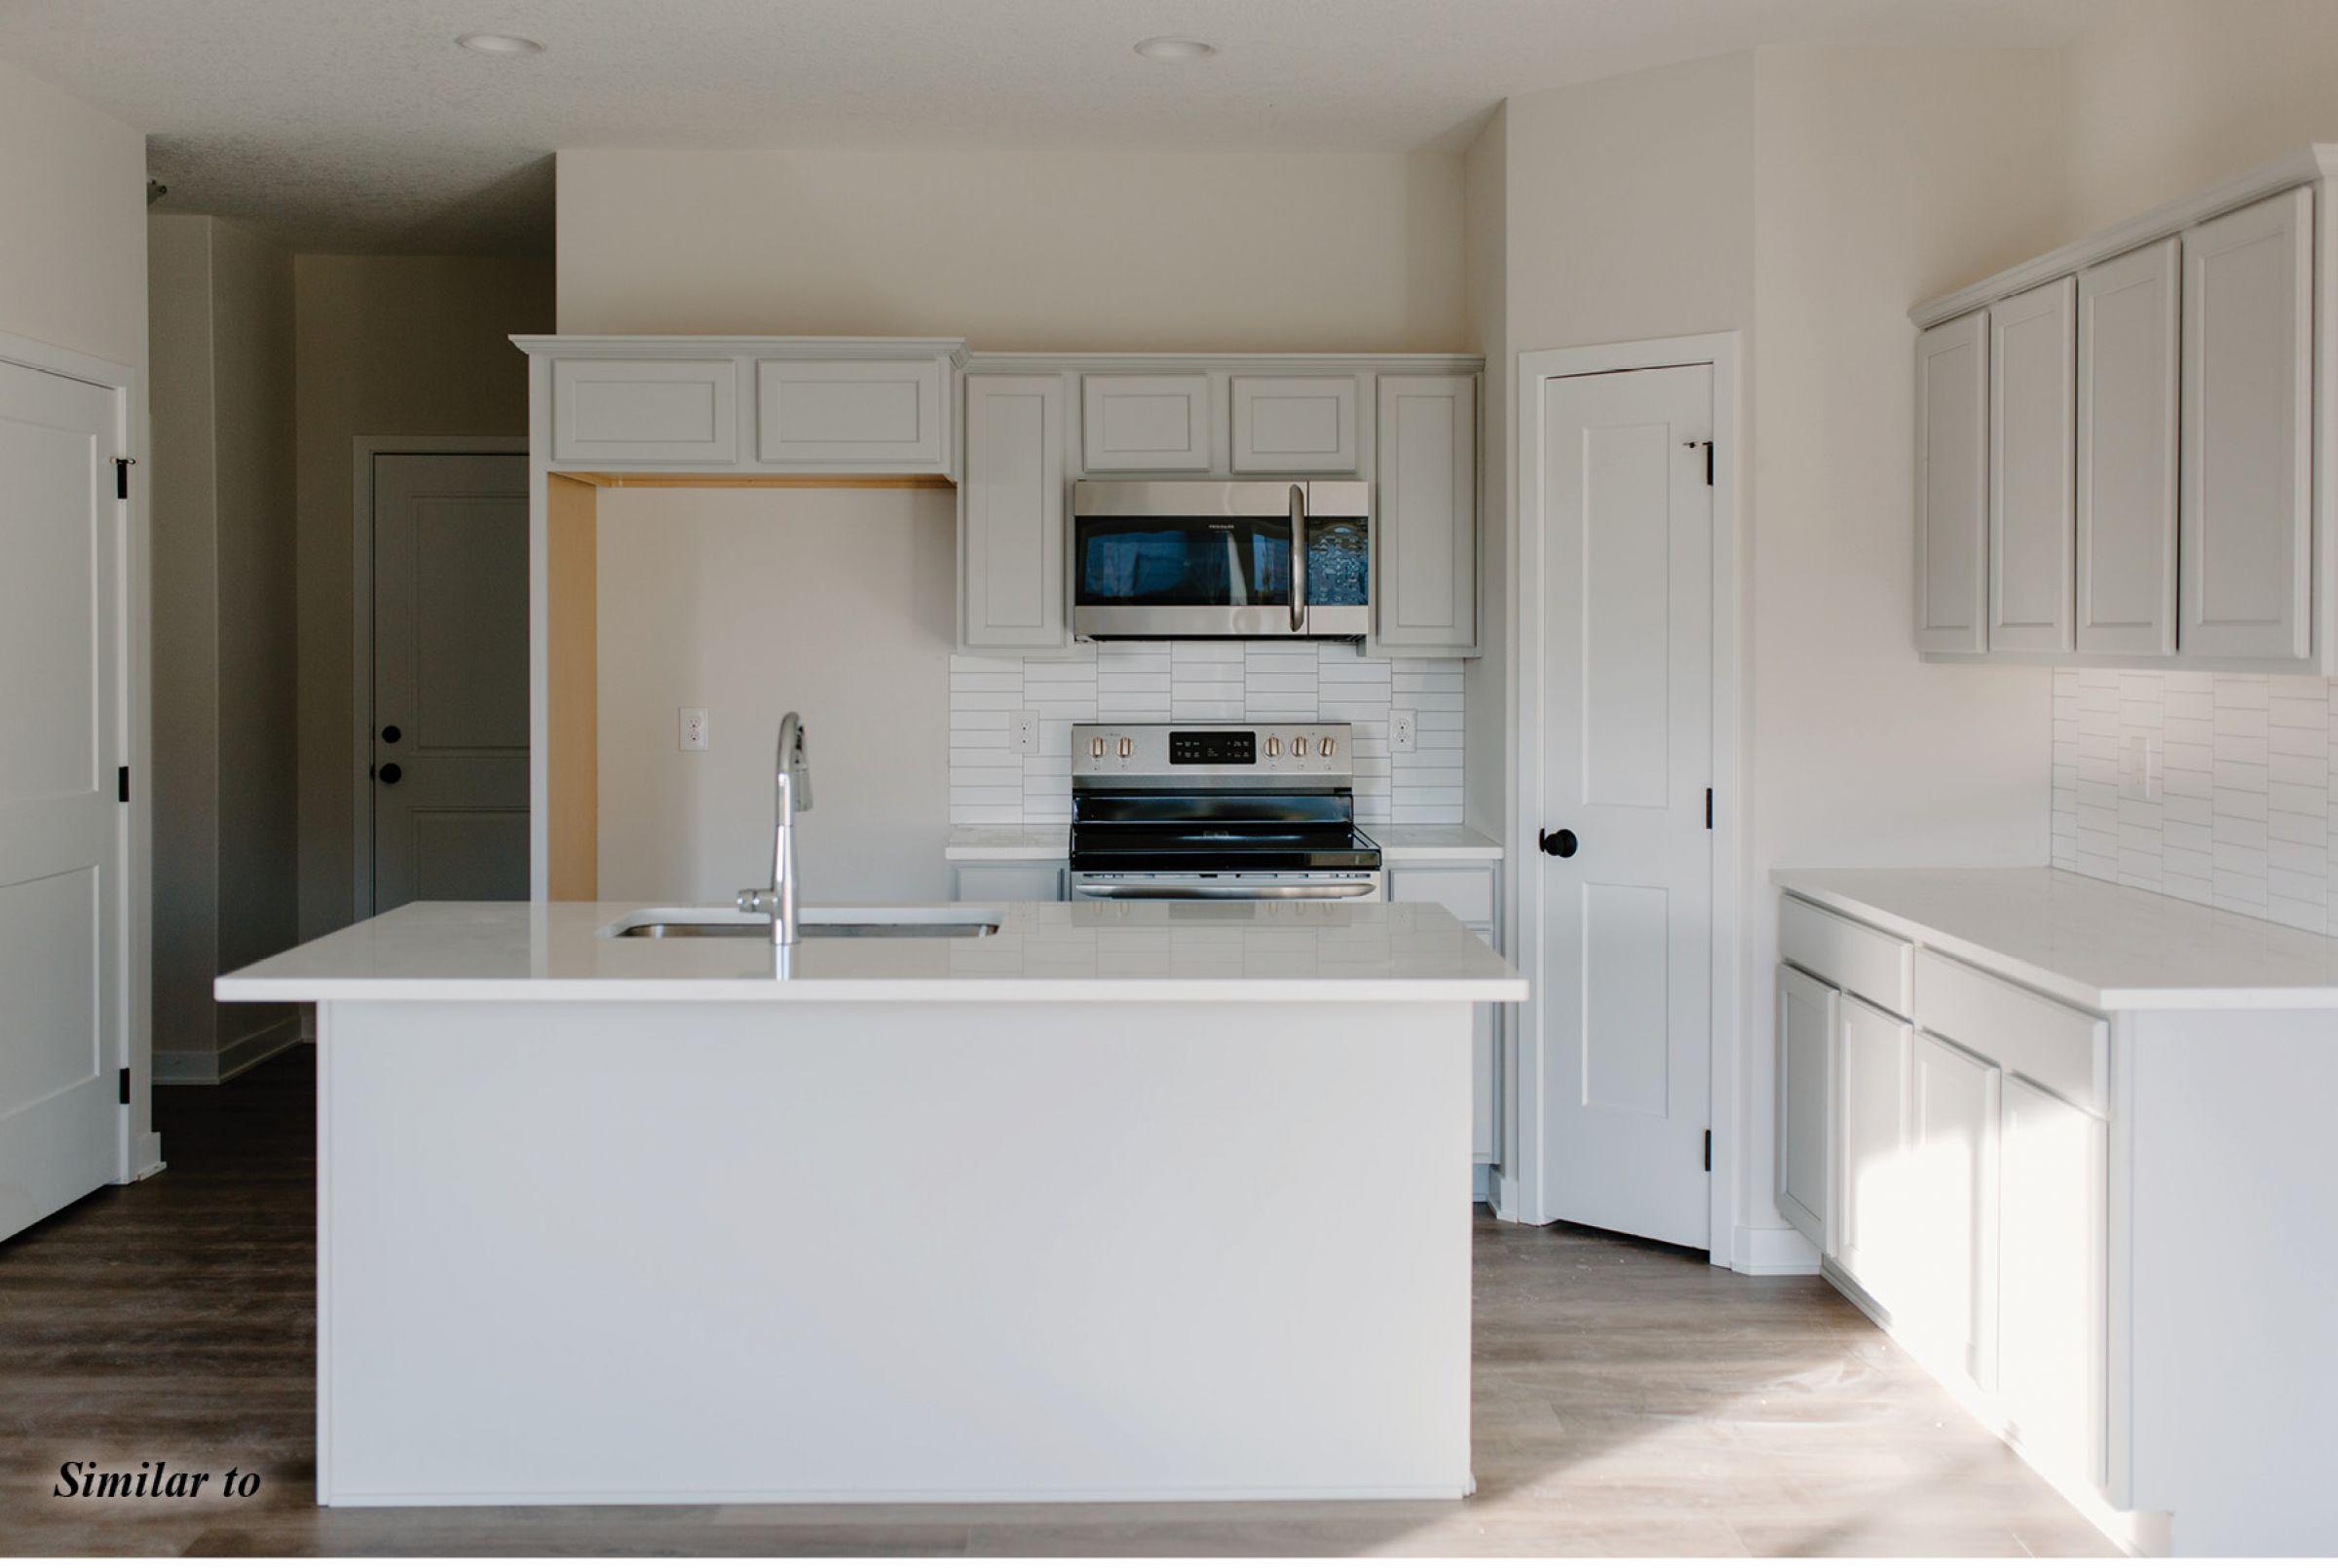 residential-warren-county-iowa-0-acres-listing-number-15674-2-2021-08-06-135346.jpg